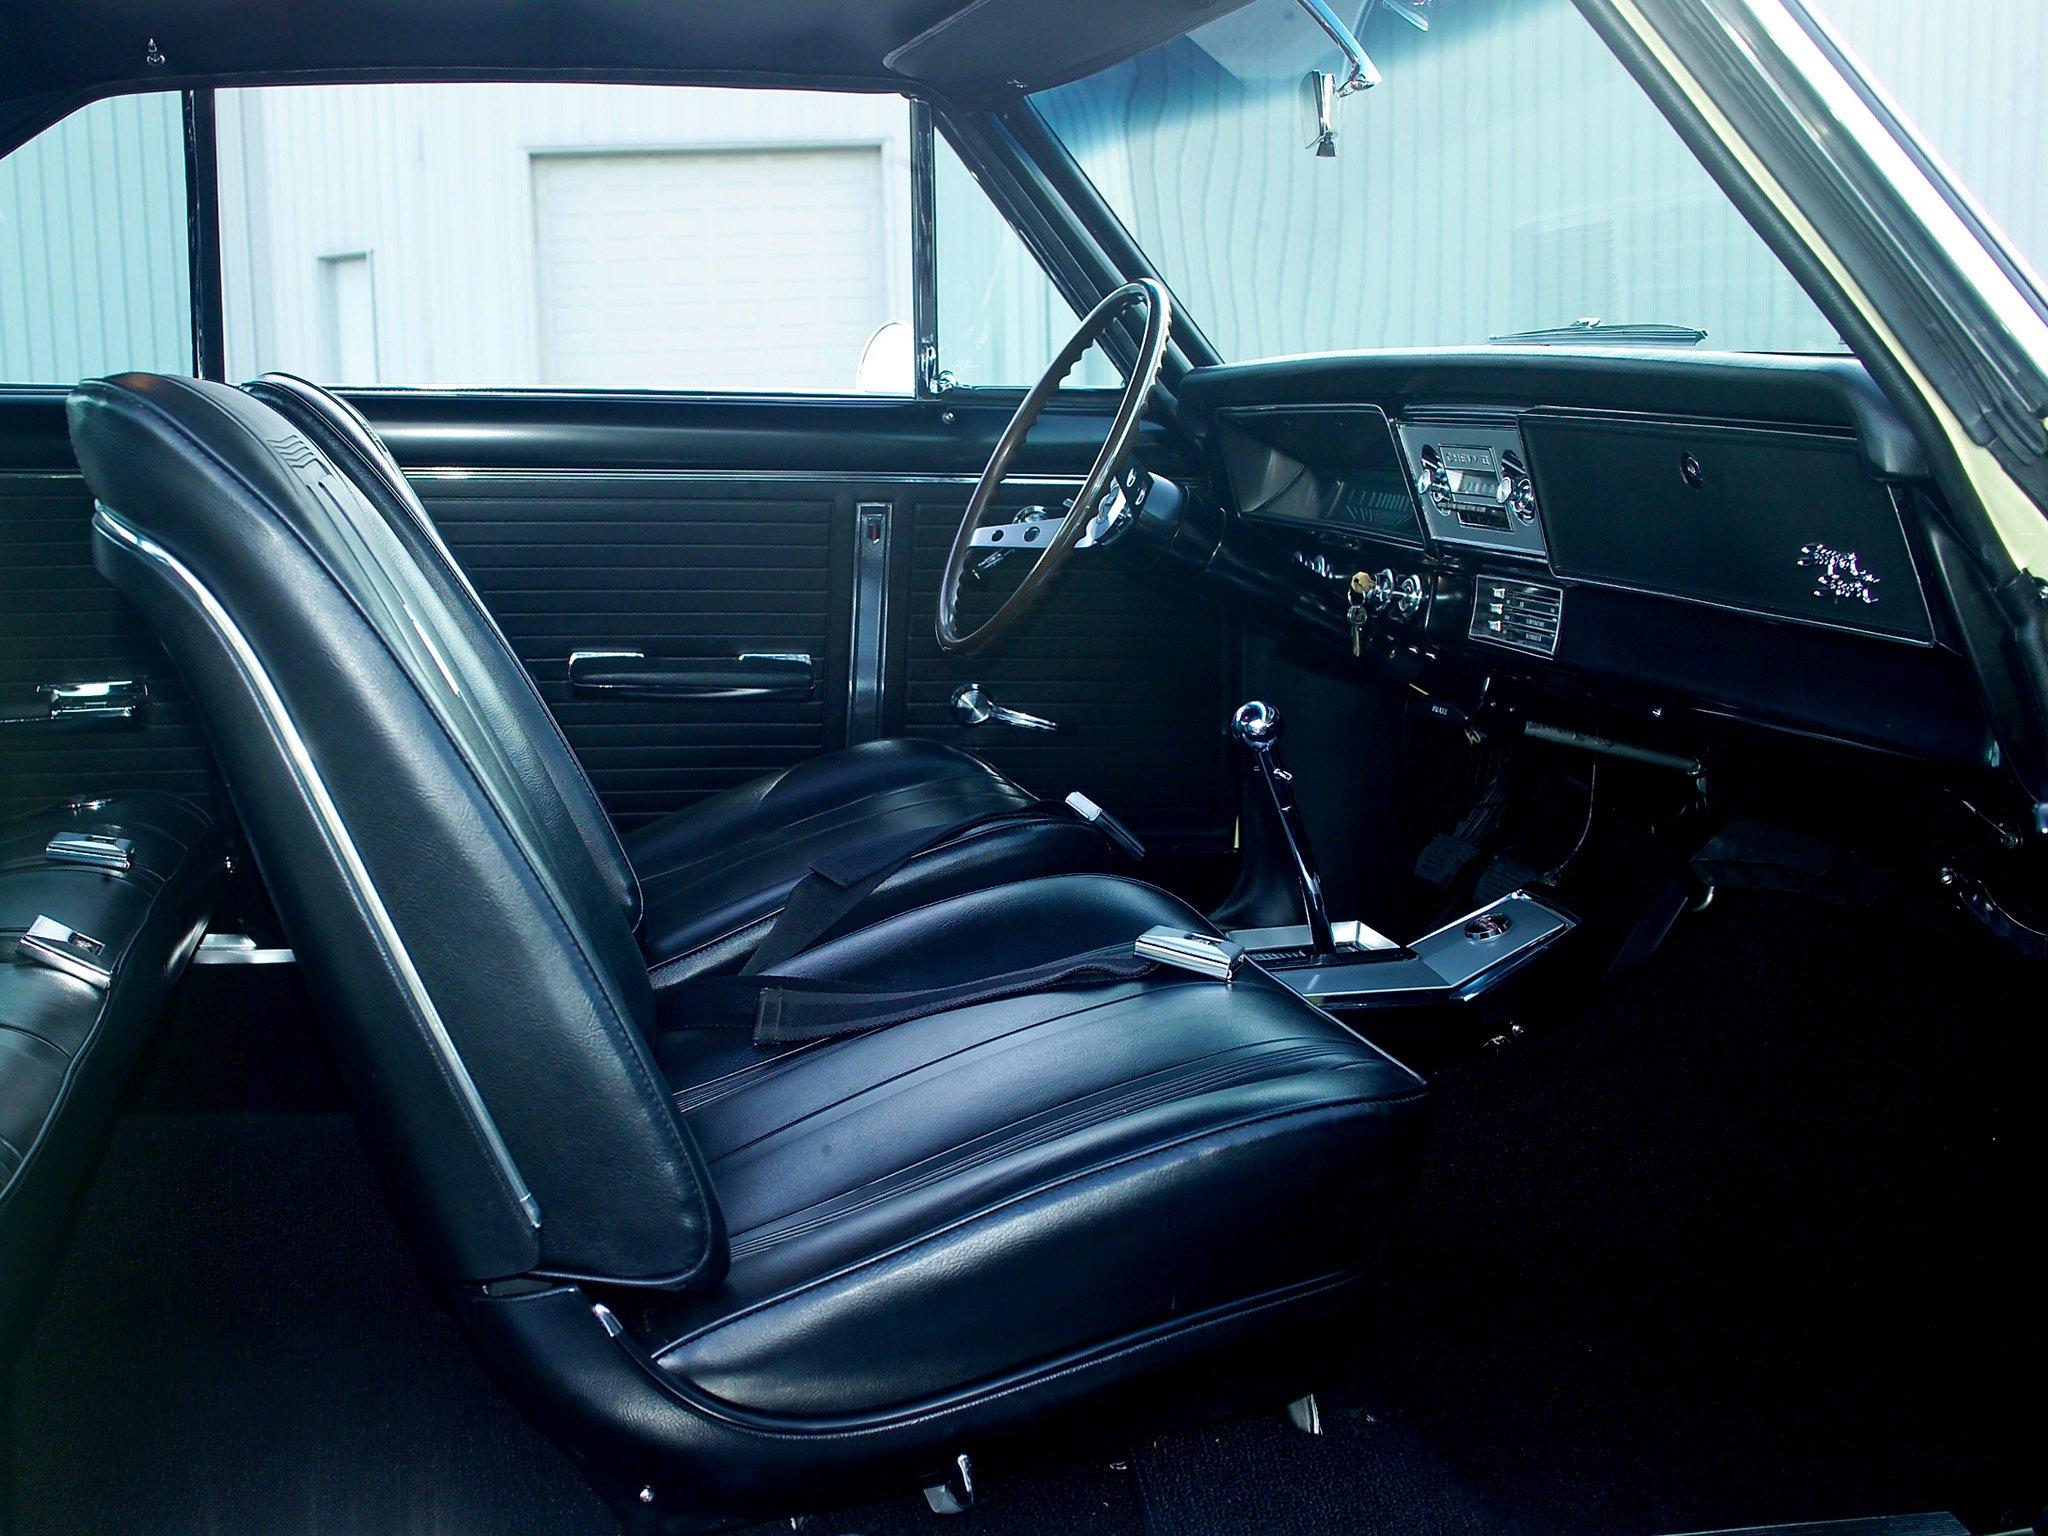 1966 Chevrolet Chevy I Nova S Hardtop Coupe 11737 11837 Muscle Ii Classic Interior G Wallpaper 2048x1536 245063 Wallpaperup